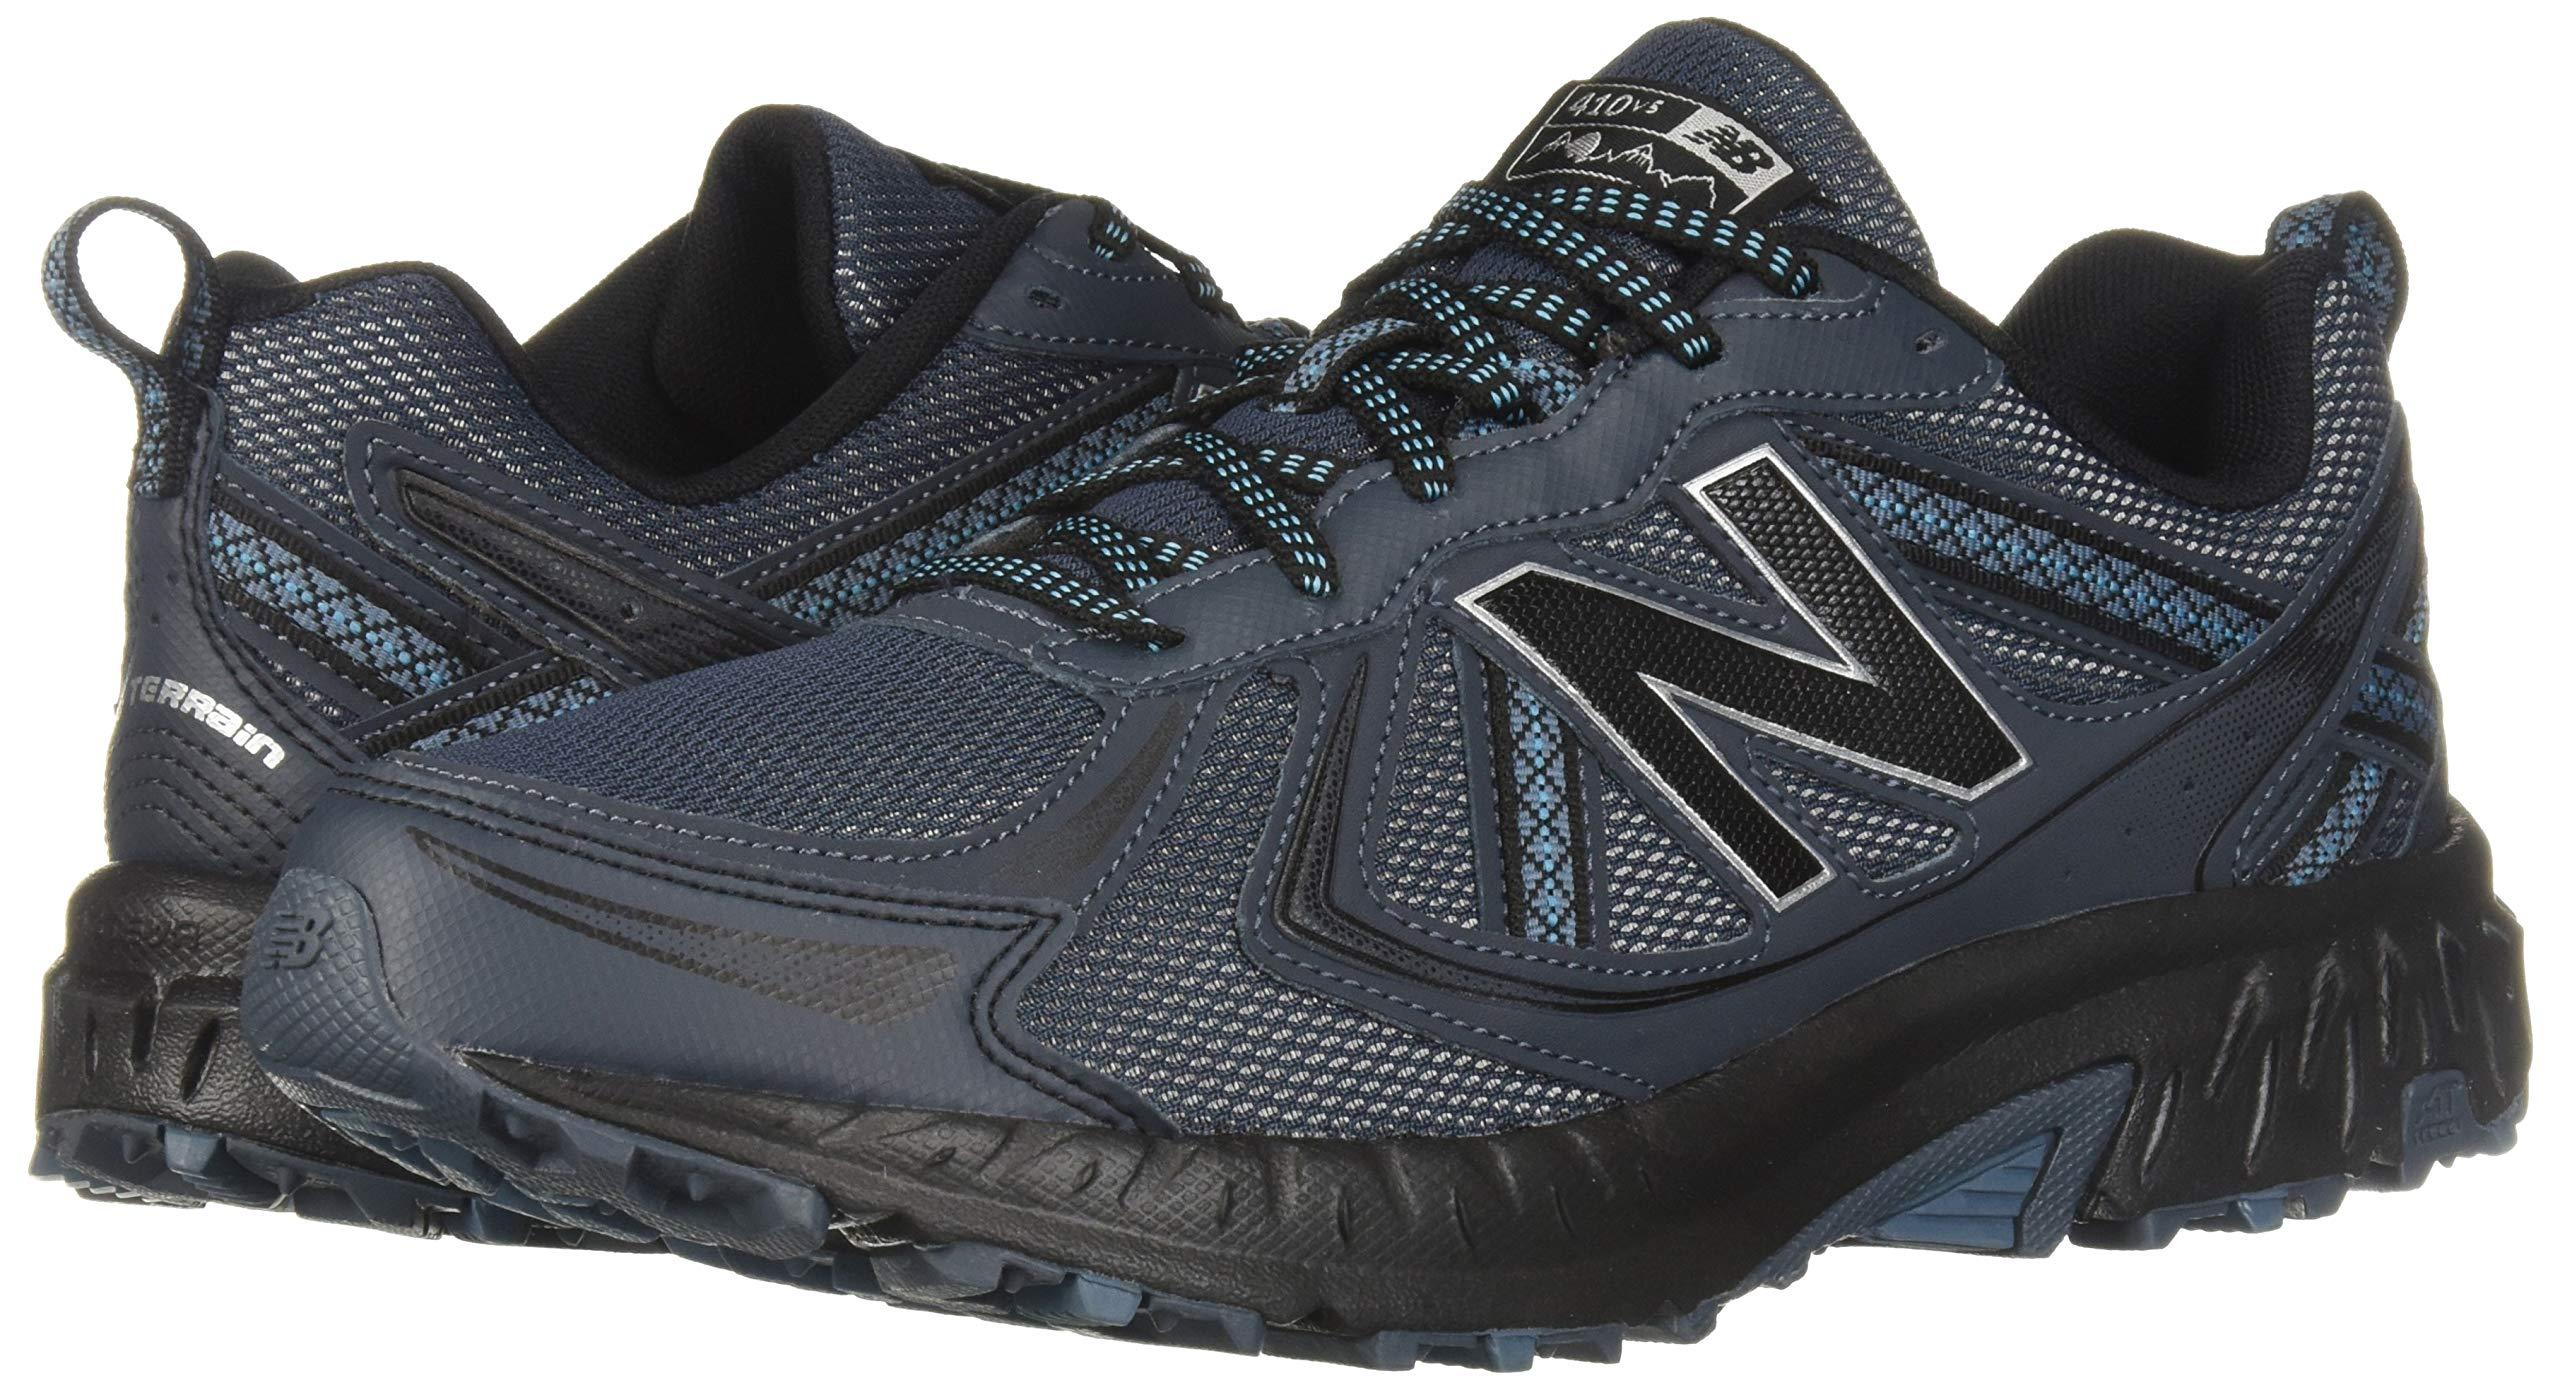 New Balance Men's 410v5 Cushioning Trail Running Shoe, Petrol/Cadet/Black, 7 D US by New Balance (Image #6)